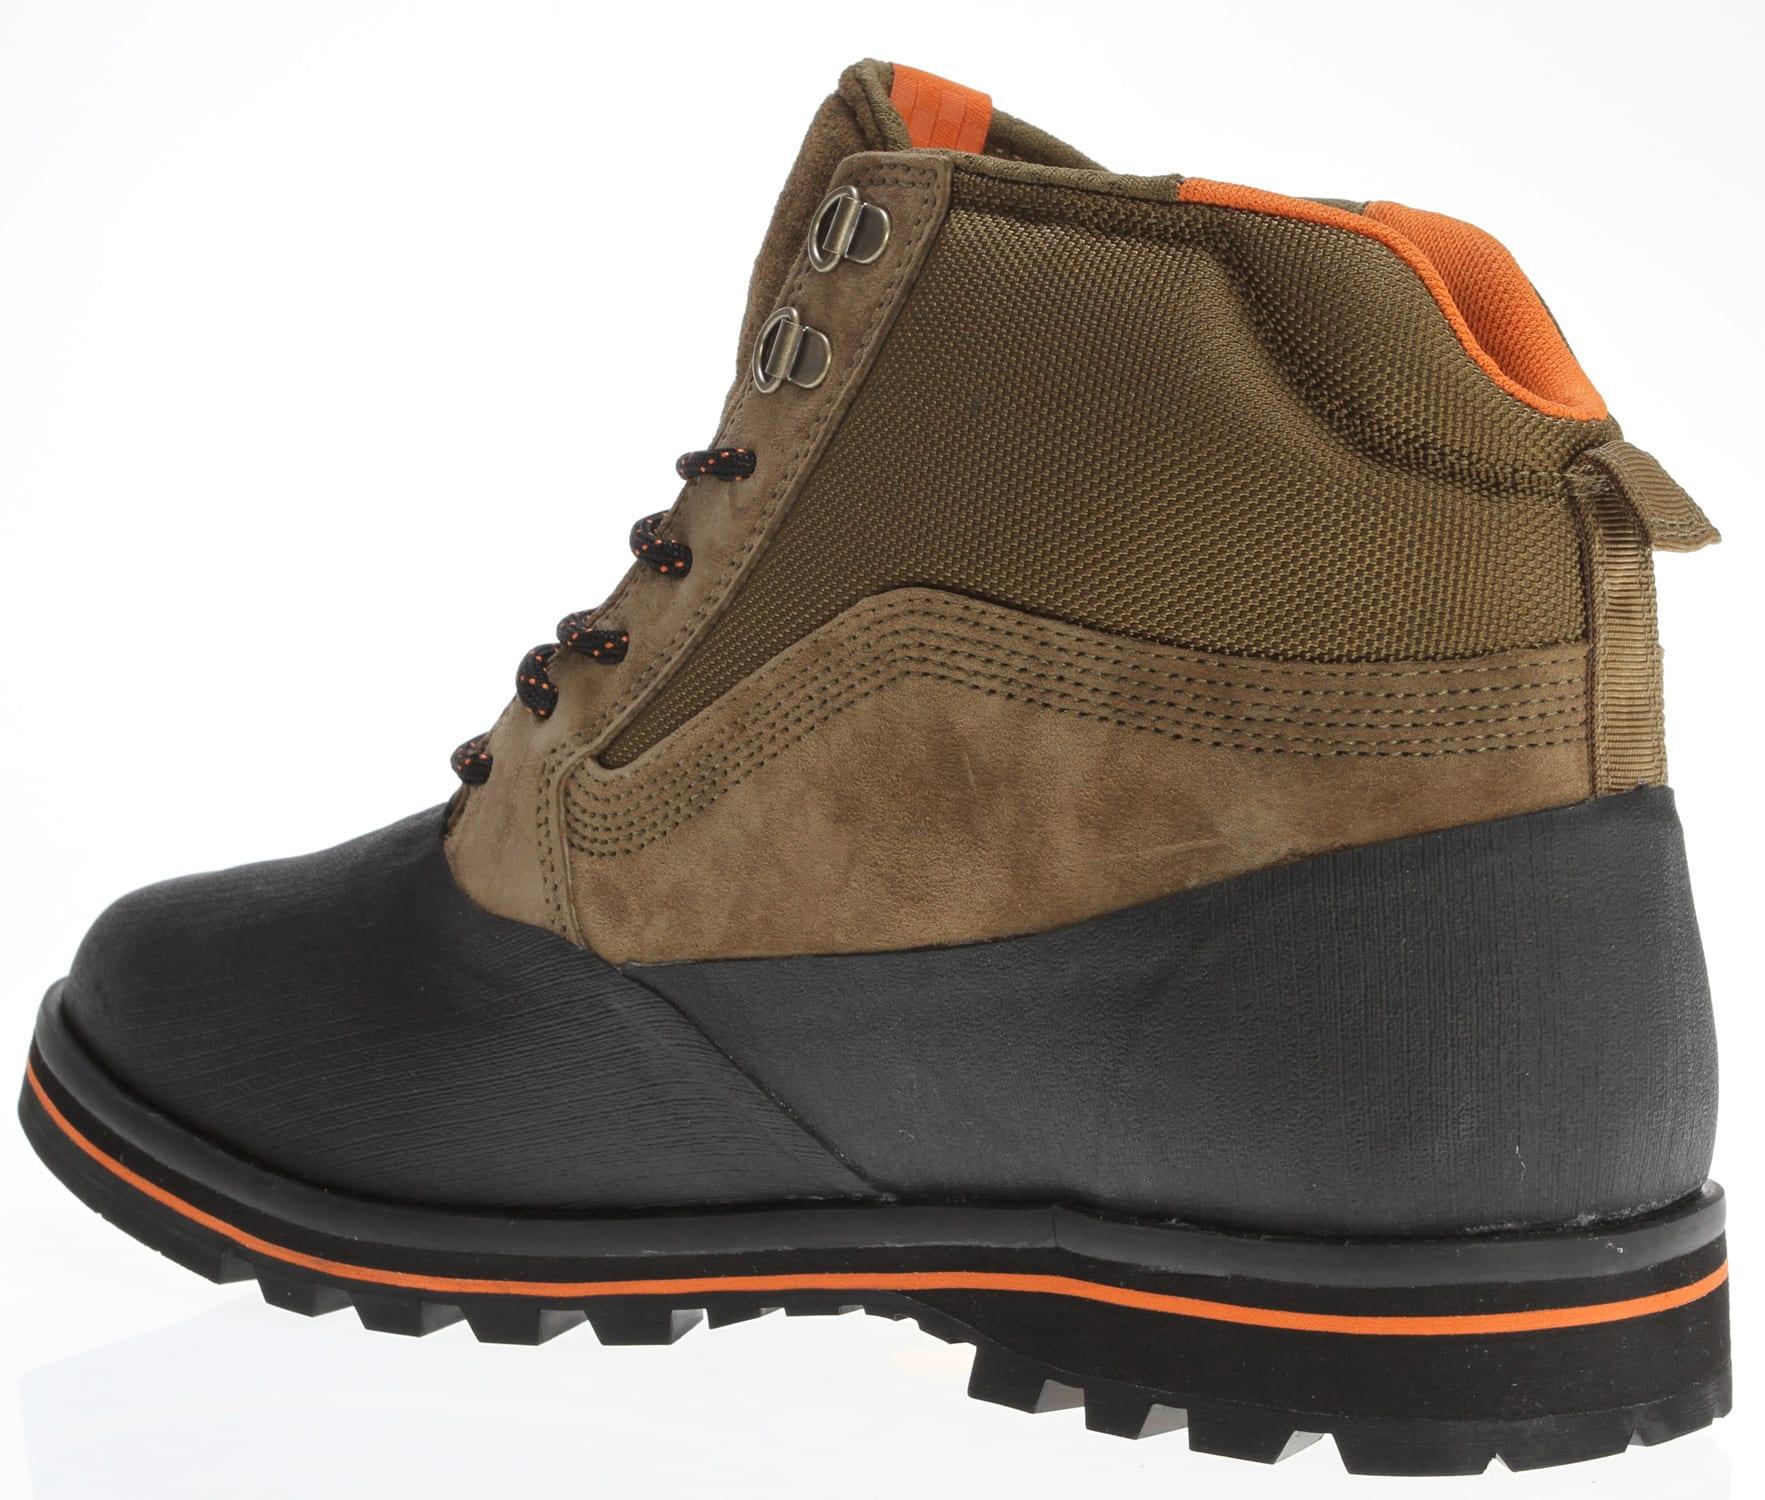 314cd03262e Vans Module Boots - thumbnail 3